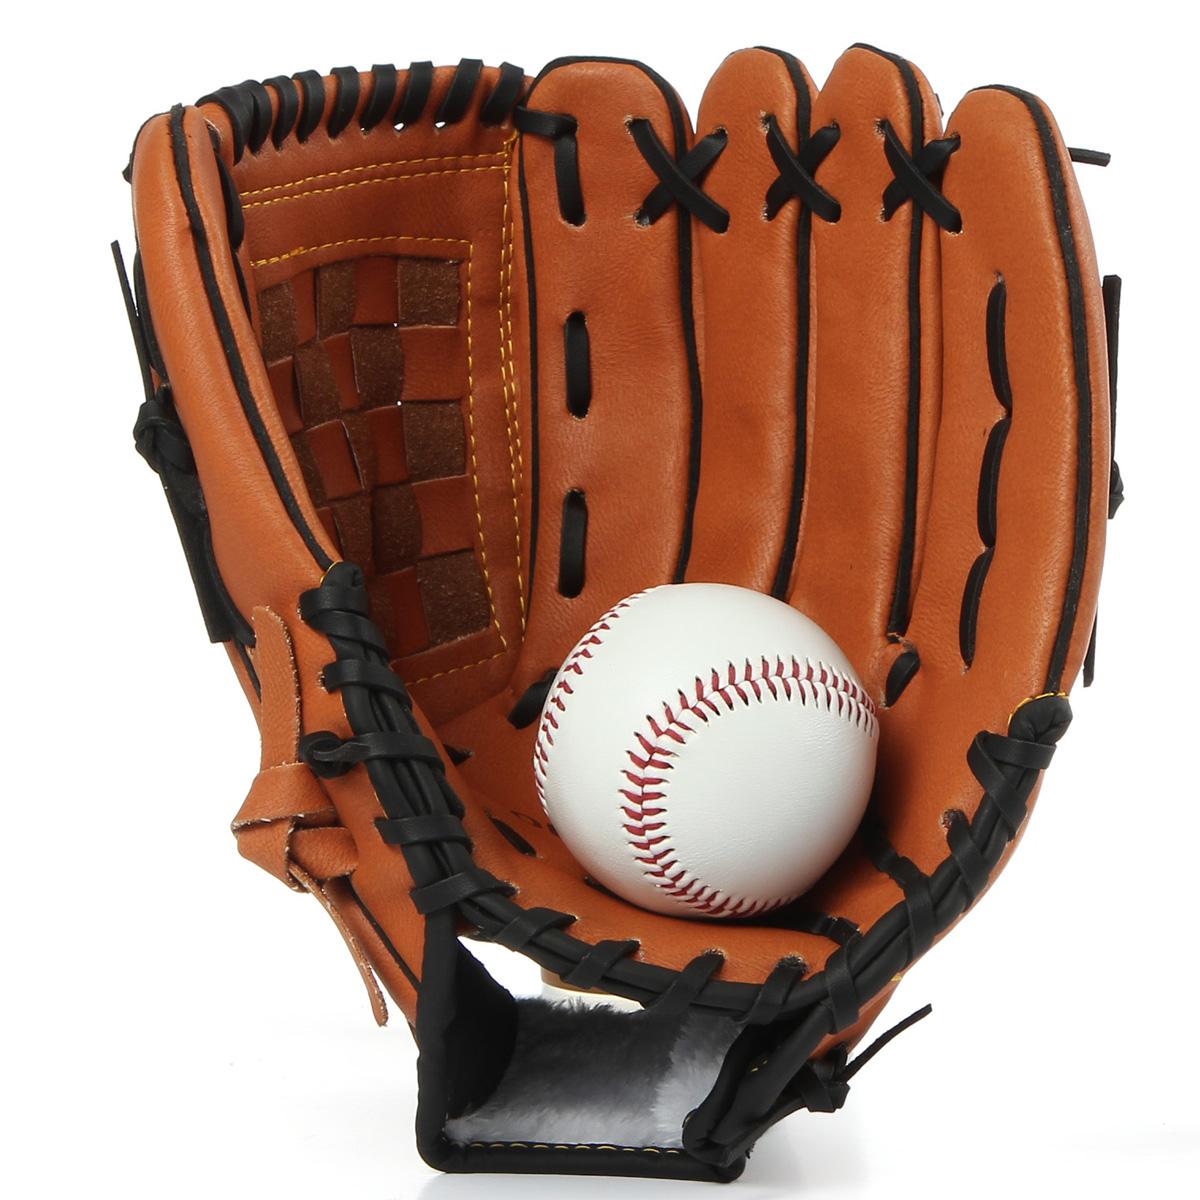 achetez en gros gant de baseball en ligne des grossistes. Black Bedroom Furniture Sets. Home Design Ideas